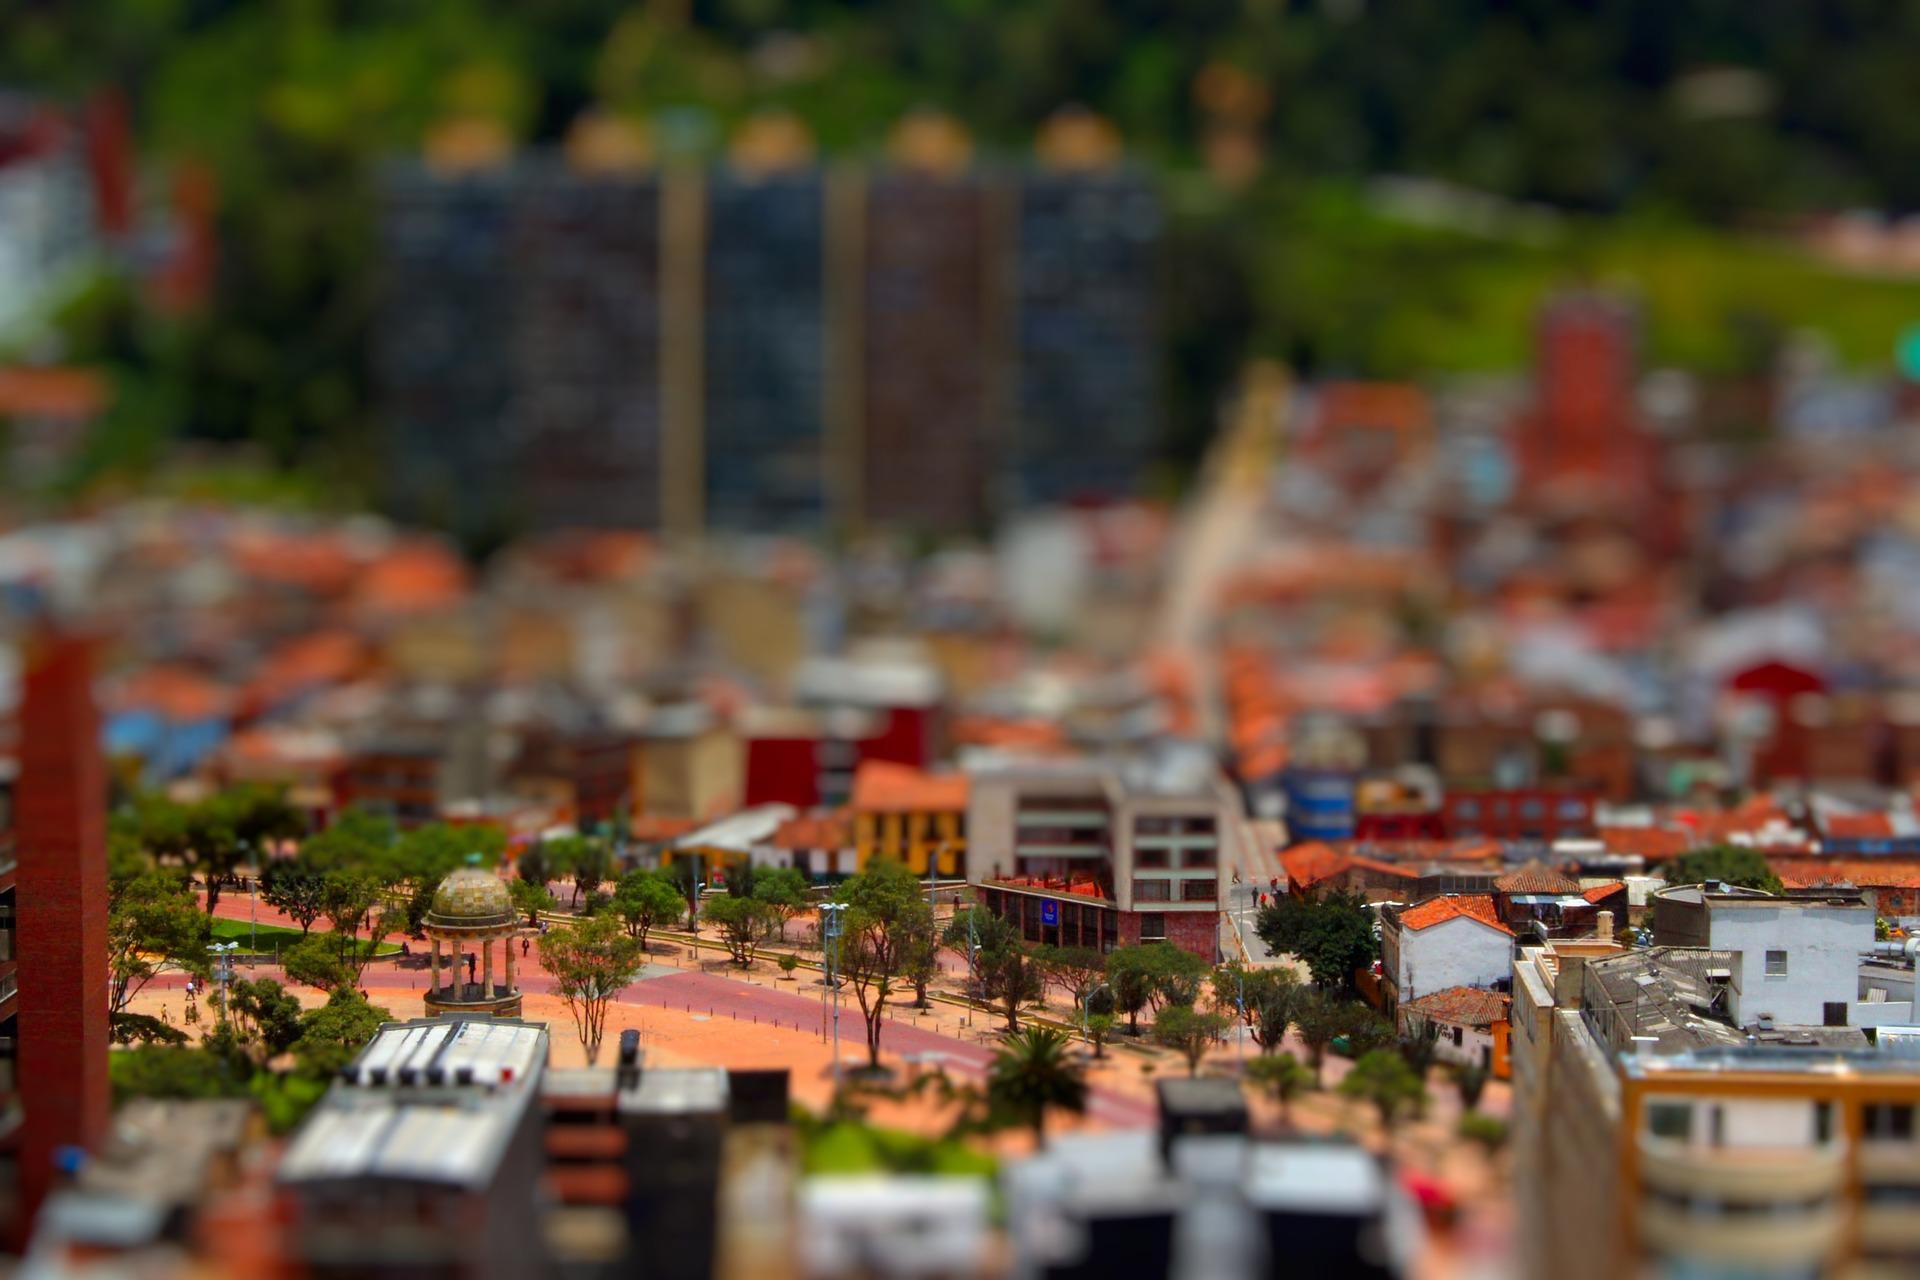 Emergencia climática: Oportunidad urbana